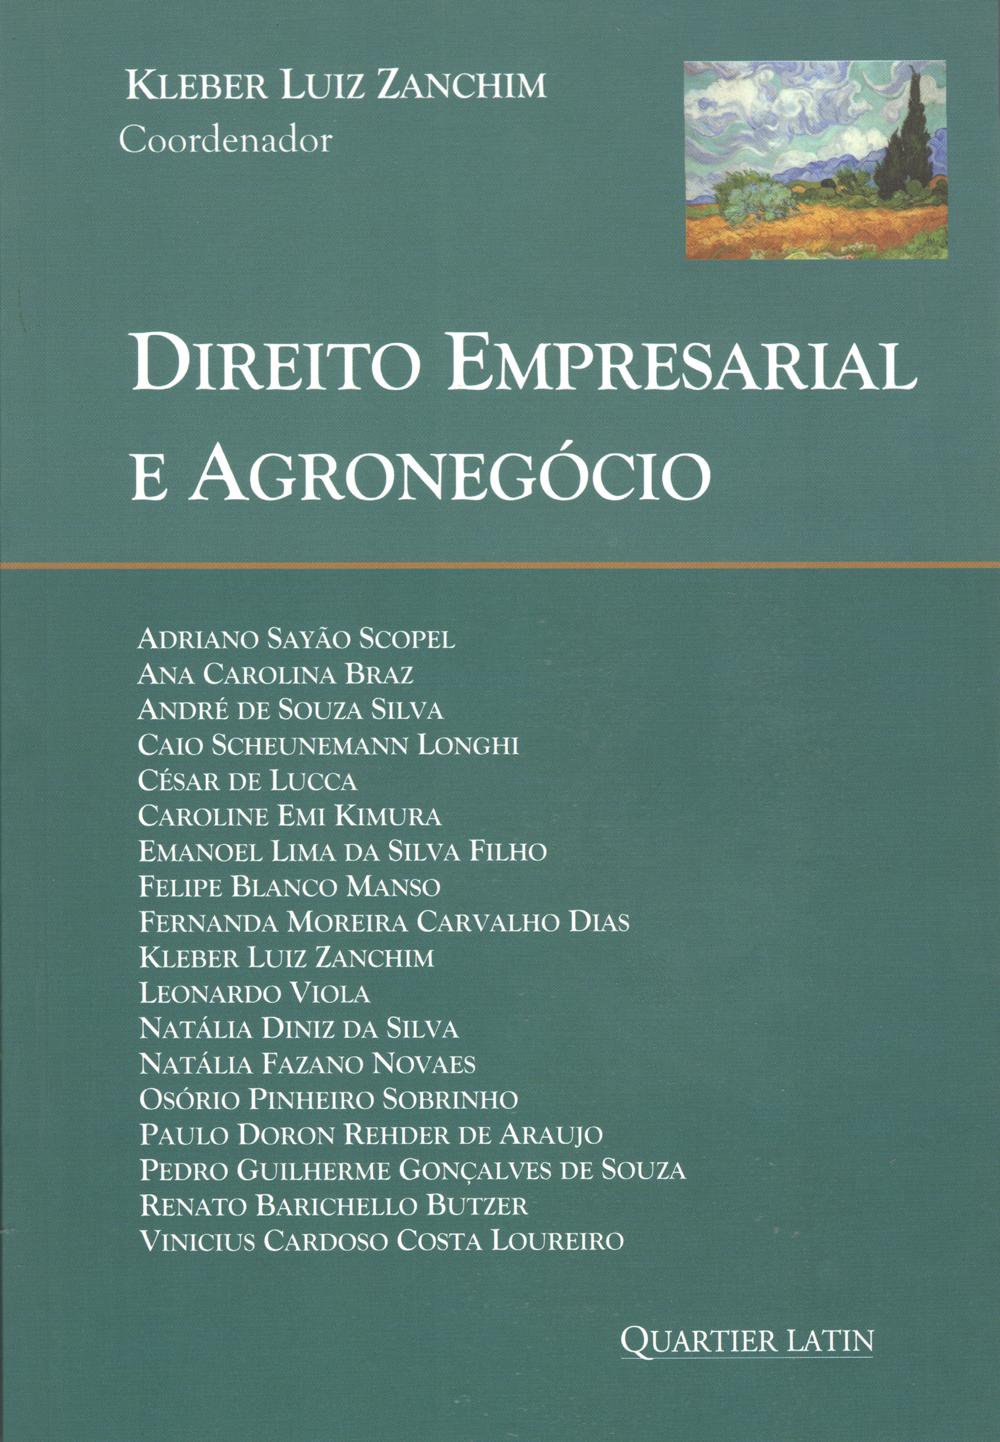 capa3.jpg